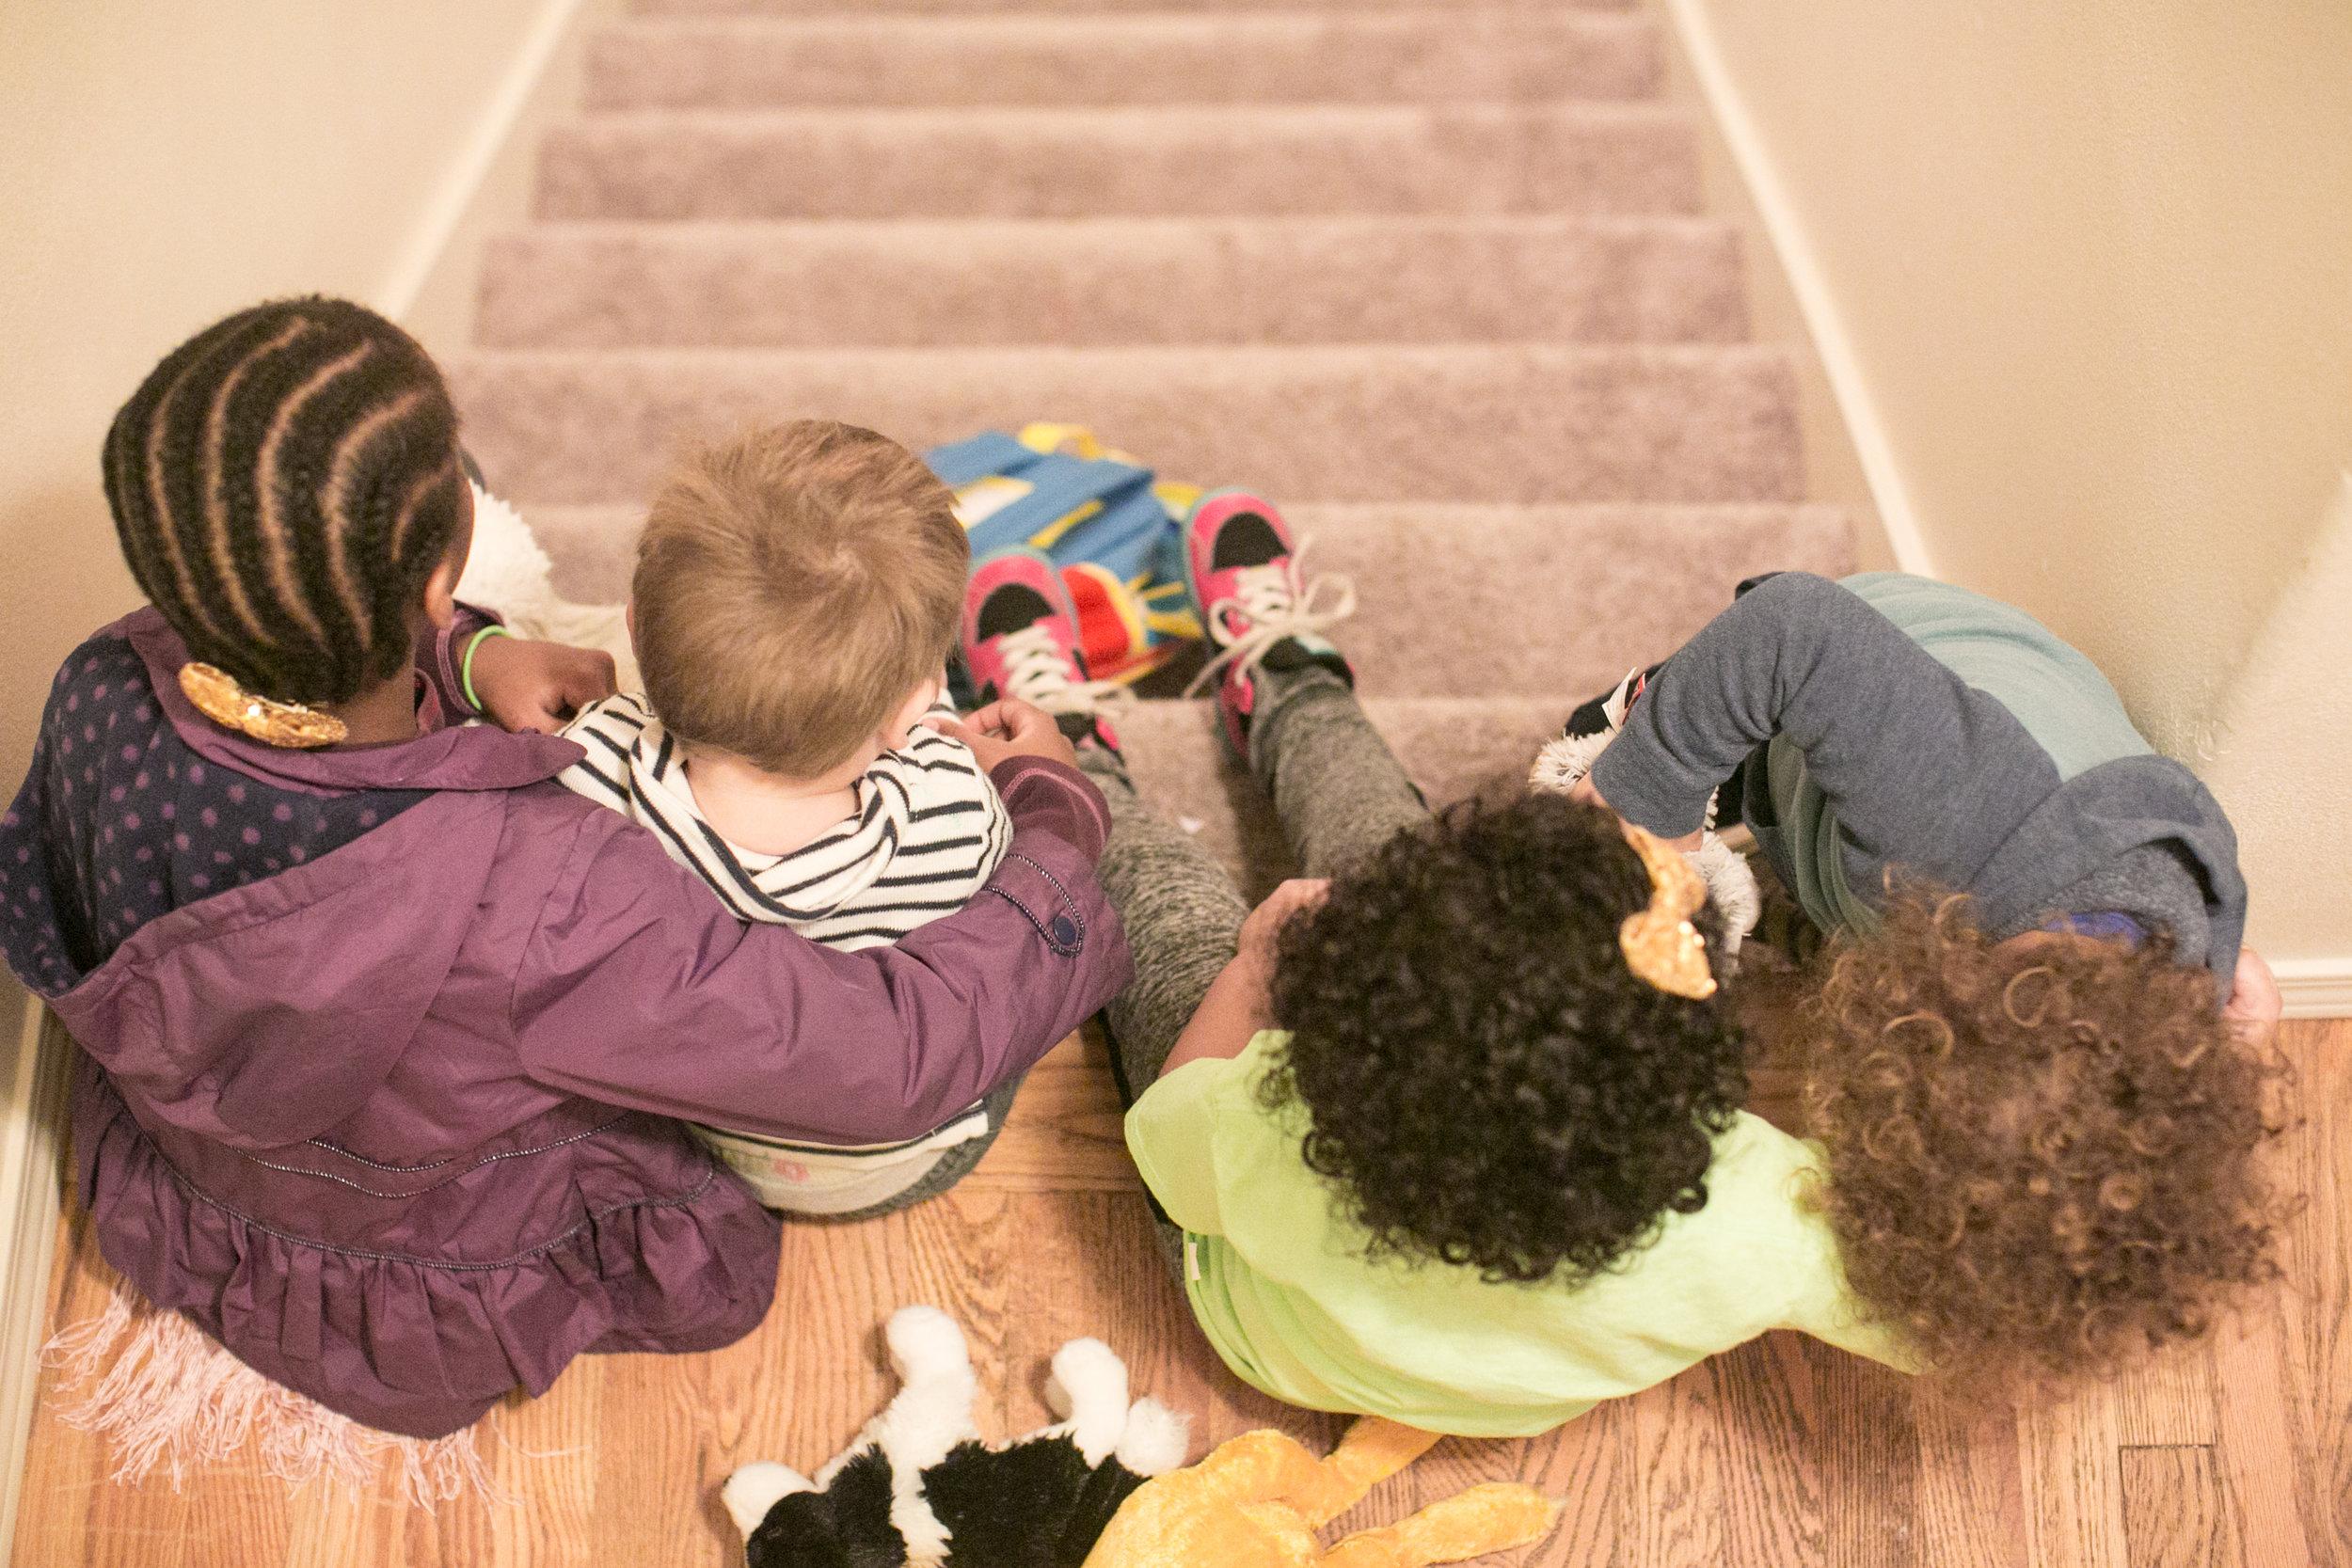 foster care family, foster family, embrace oregon portland oregon, natalie brenner